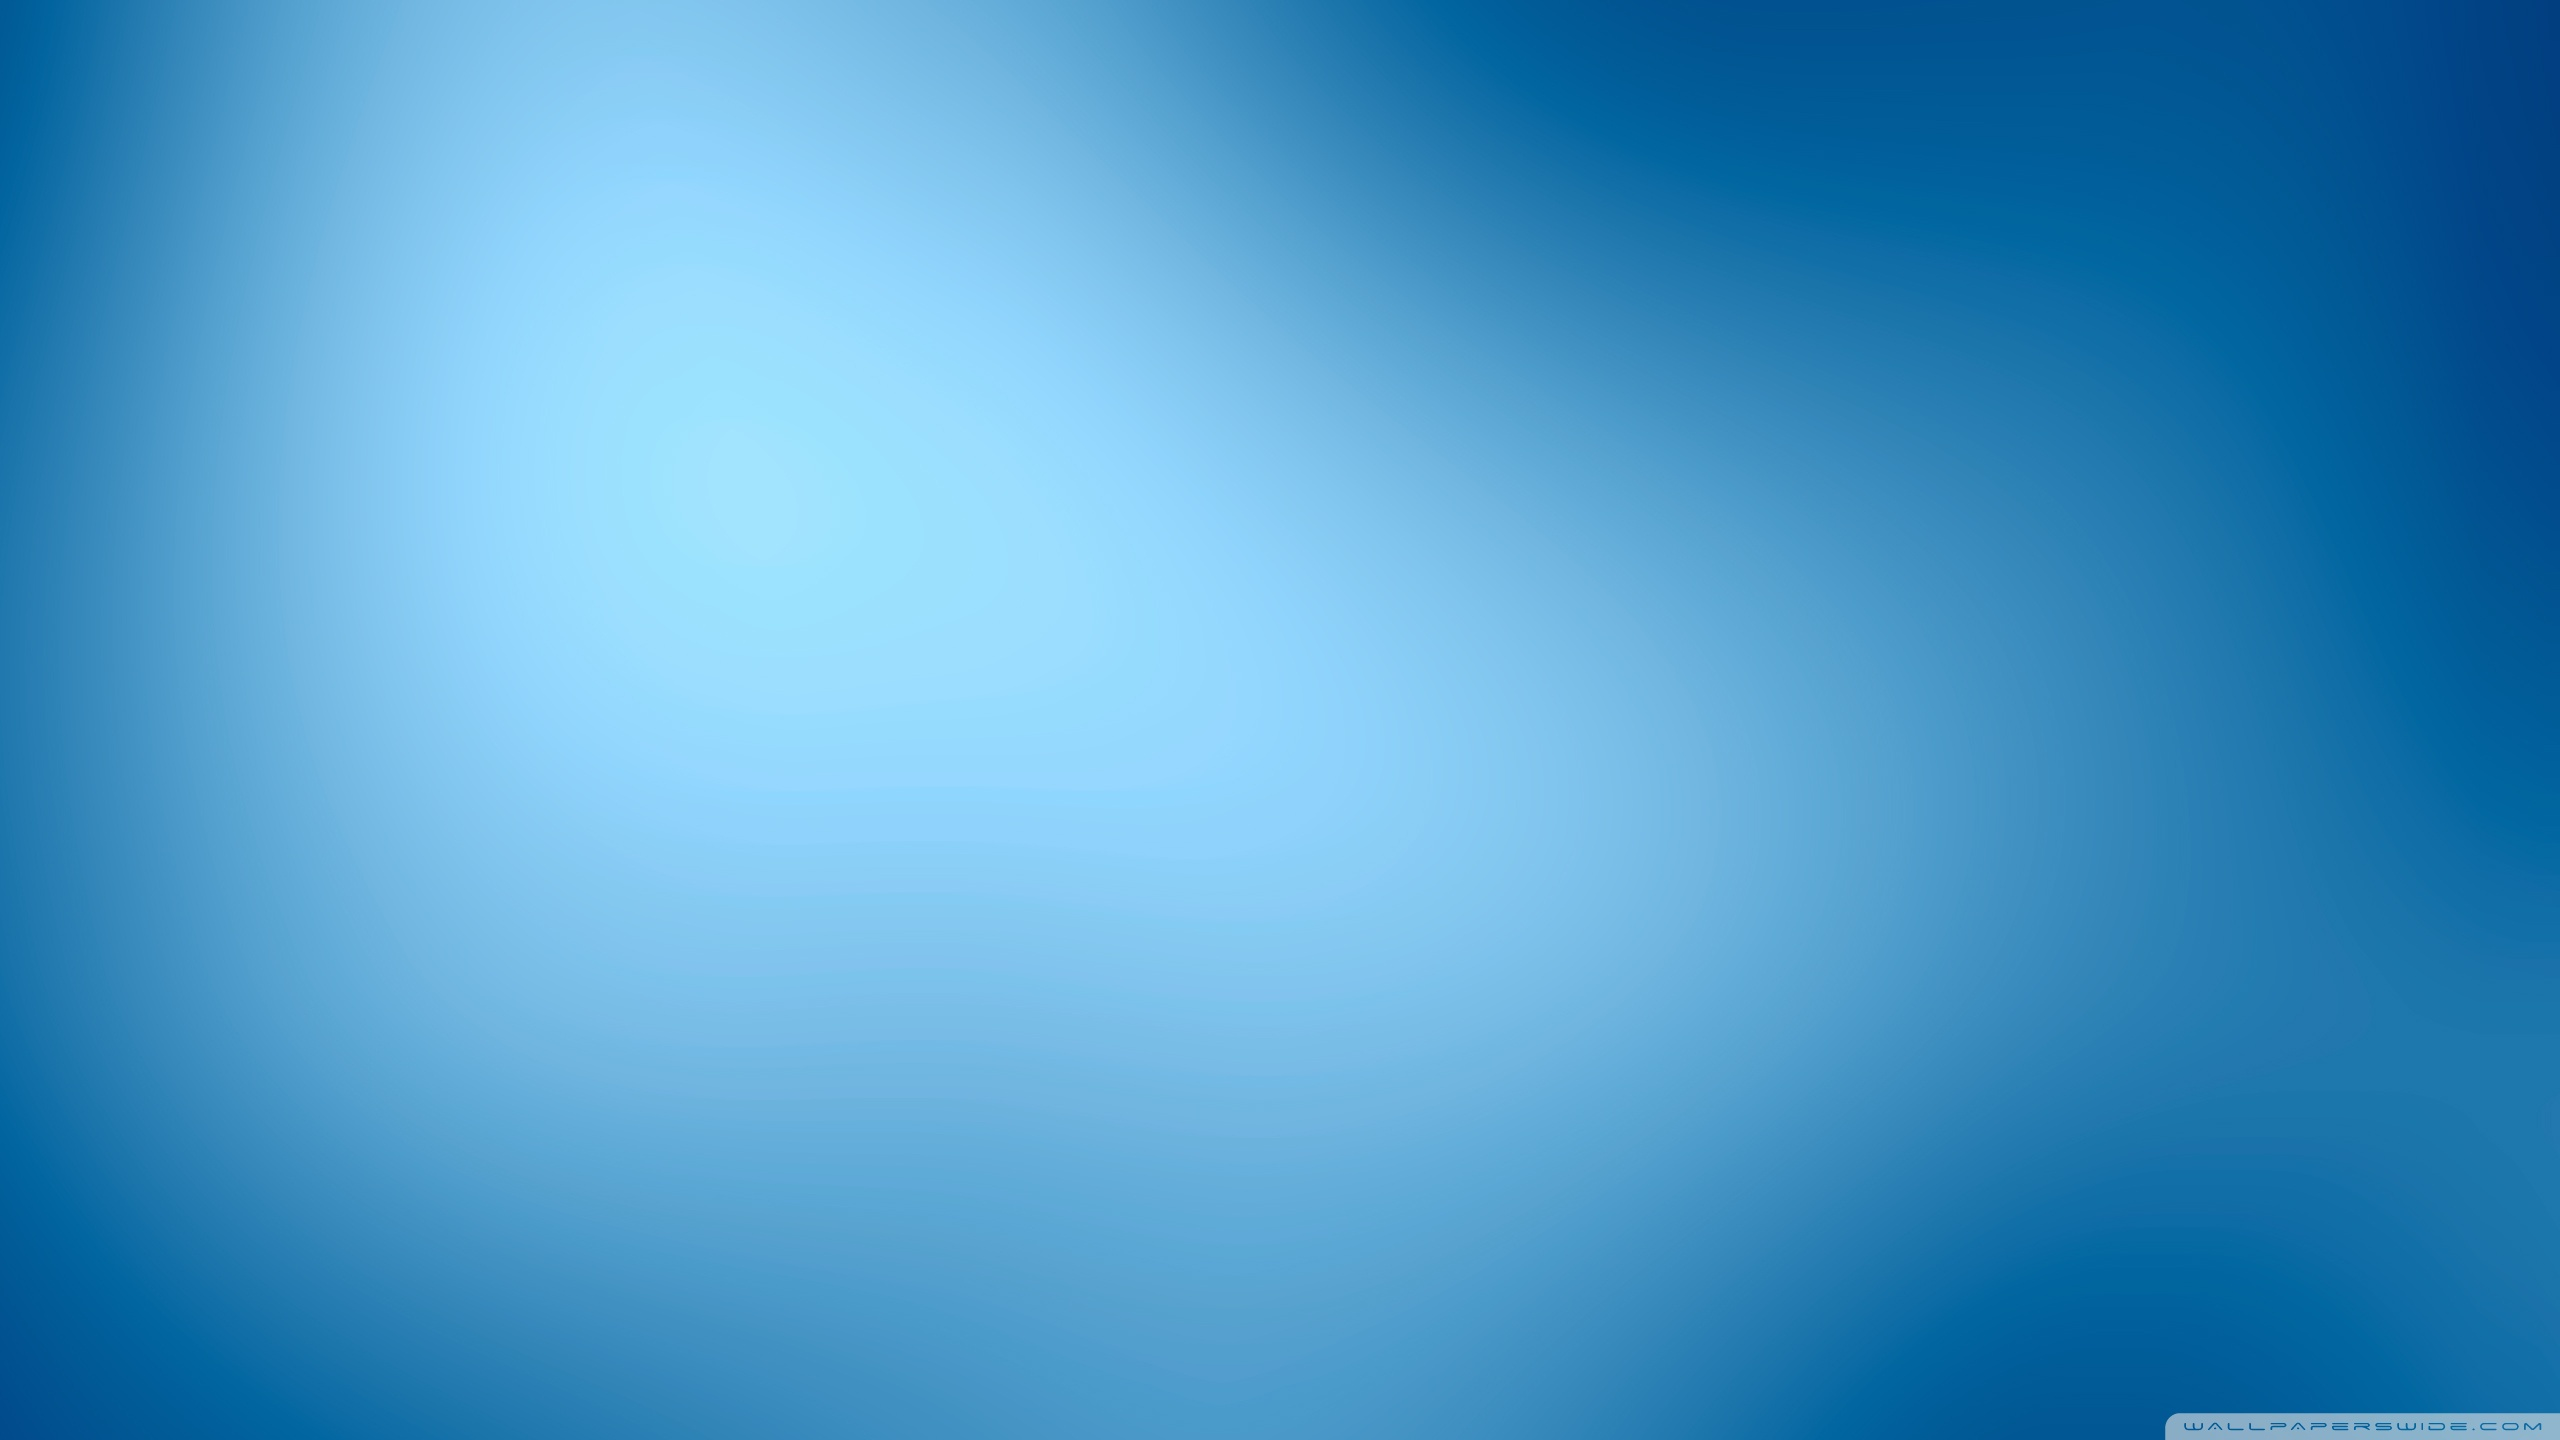 Simple Blue Background HD desktop wallpaper : High Definition